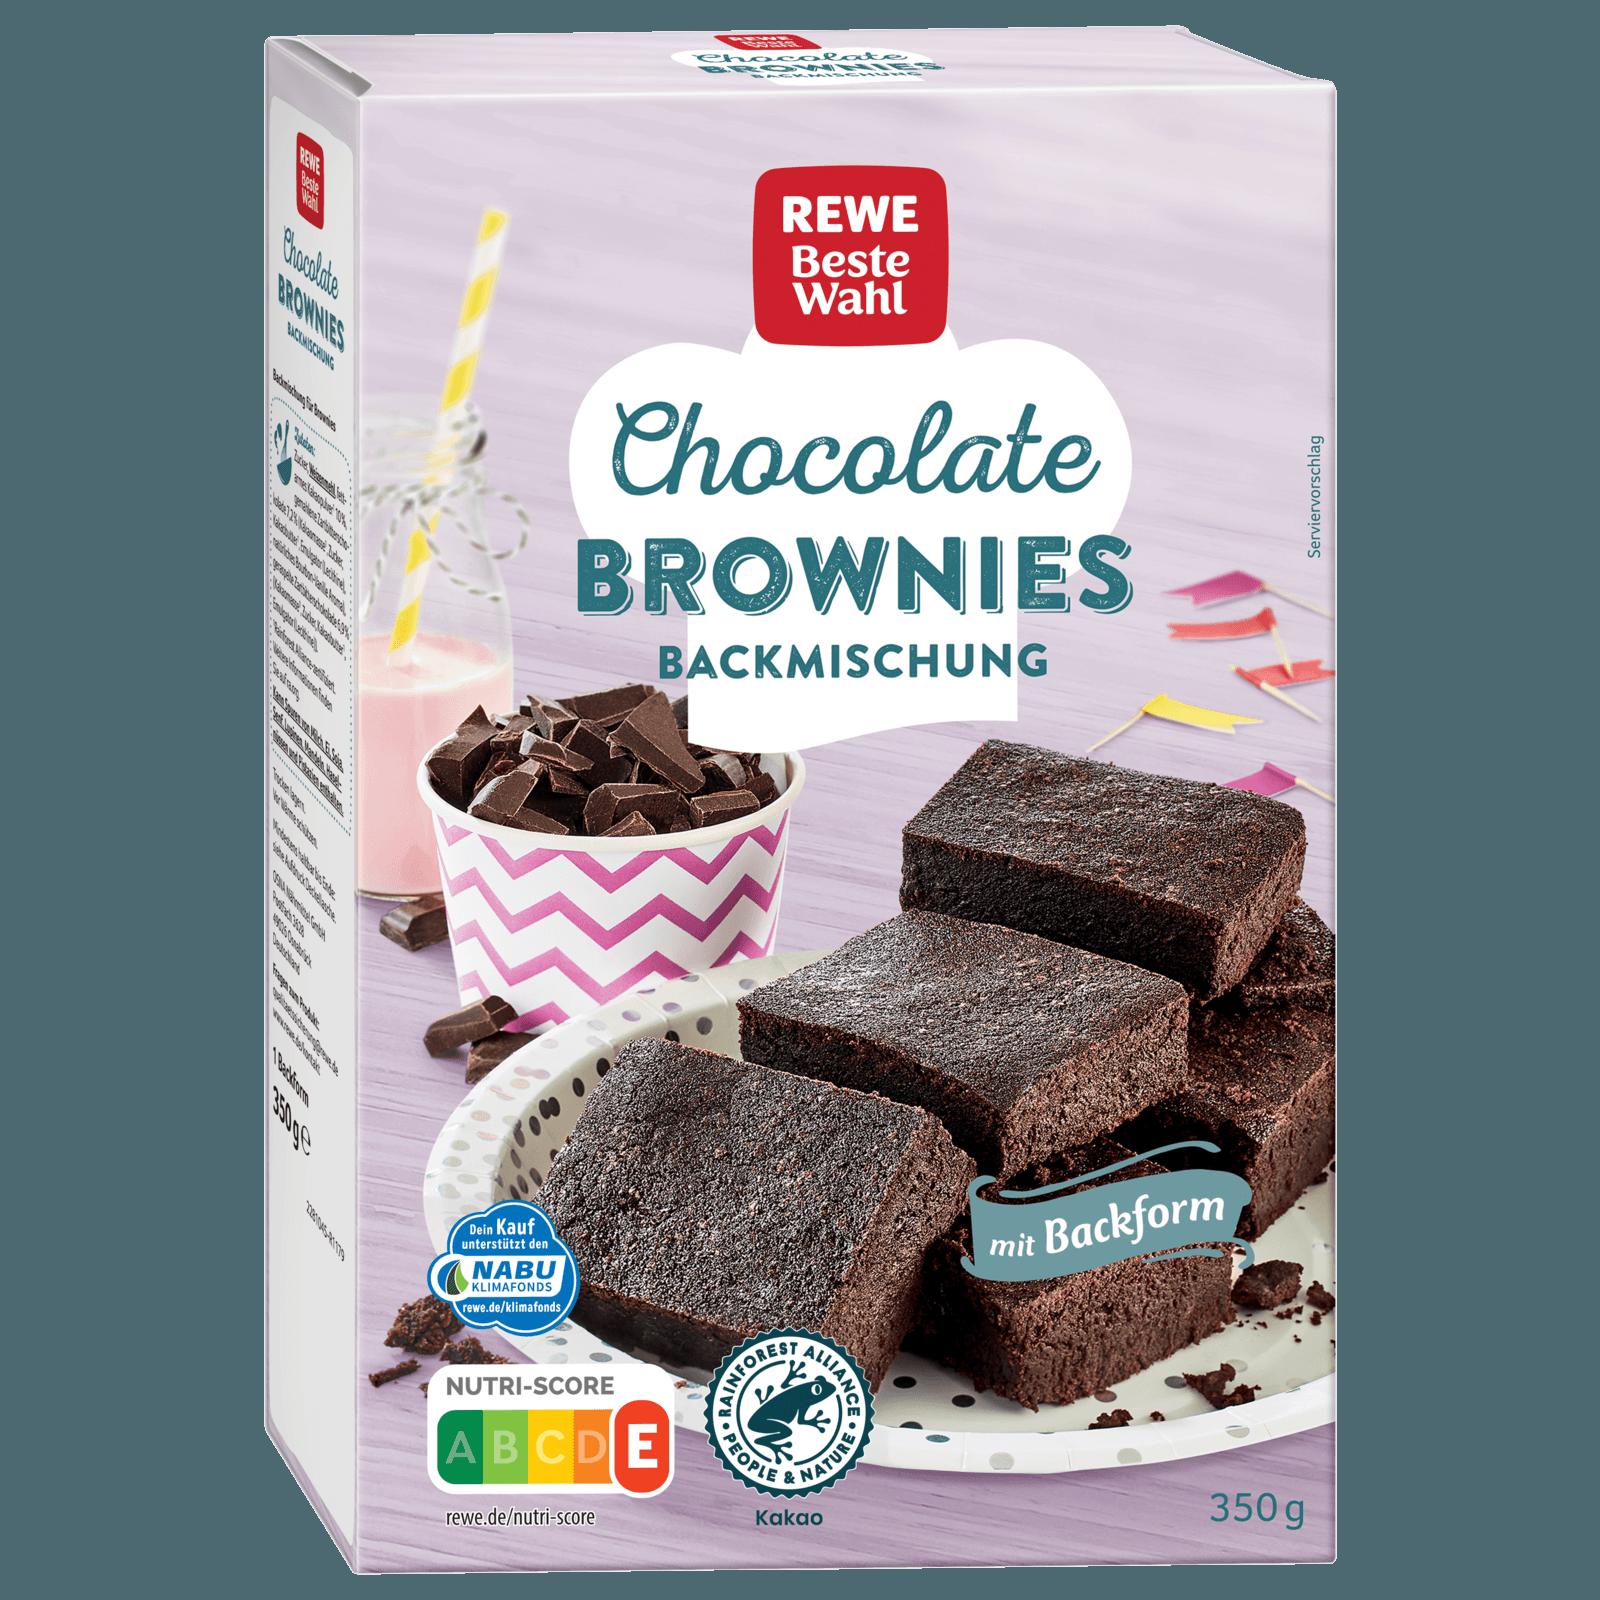 Rewe Beste Wahl Chocolate Brownies 360g Bei Rewe Online Bestellen